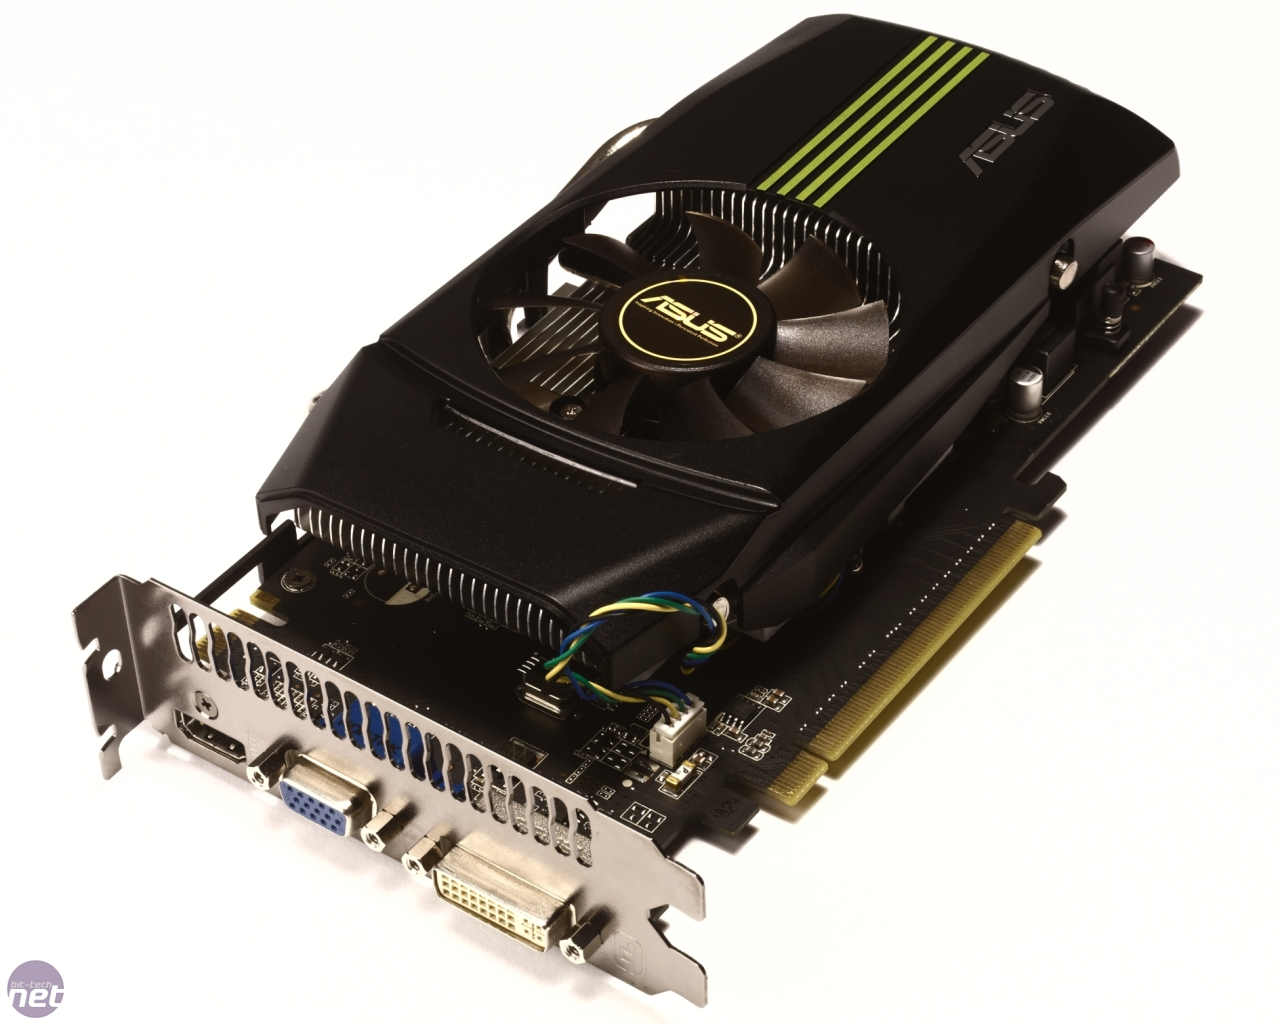 Nvidia geforce 6150se - dfeb5